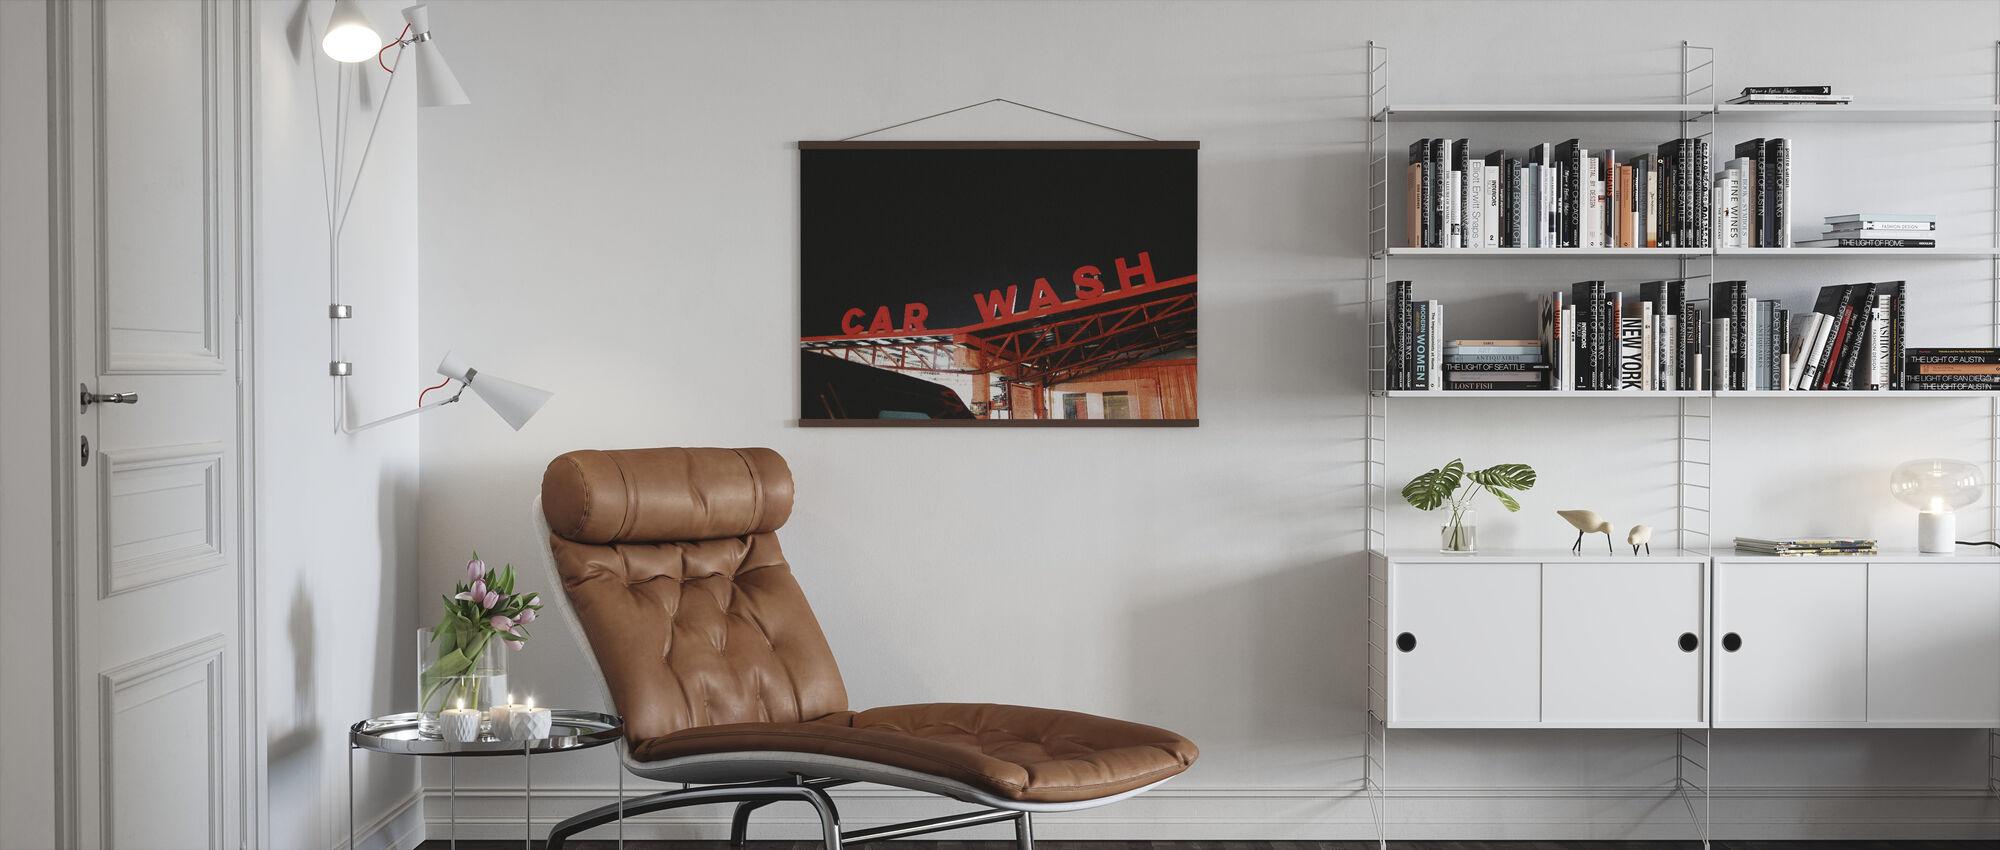 Car Wash - Poster - Living Room